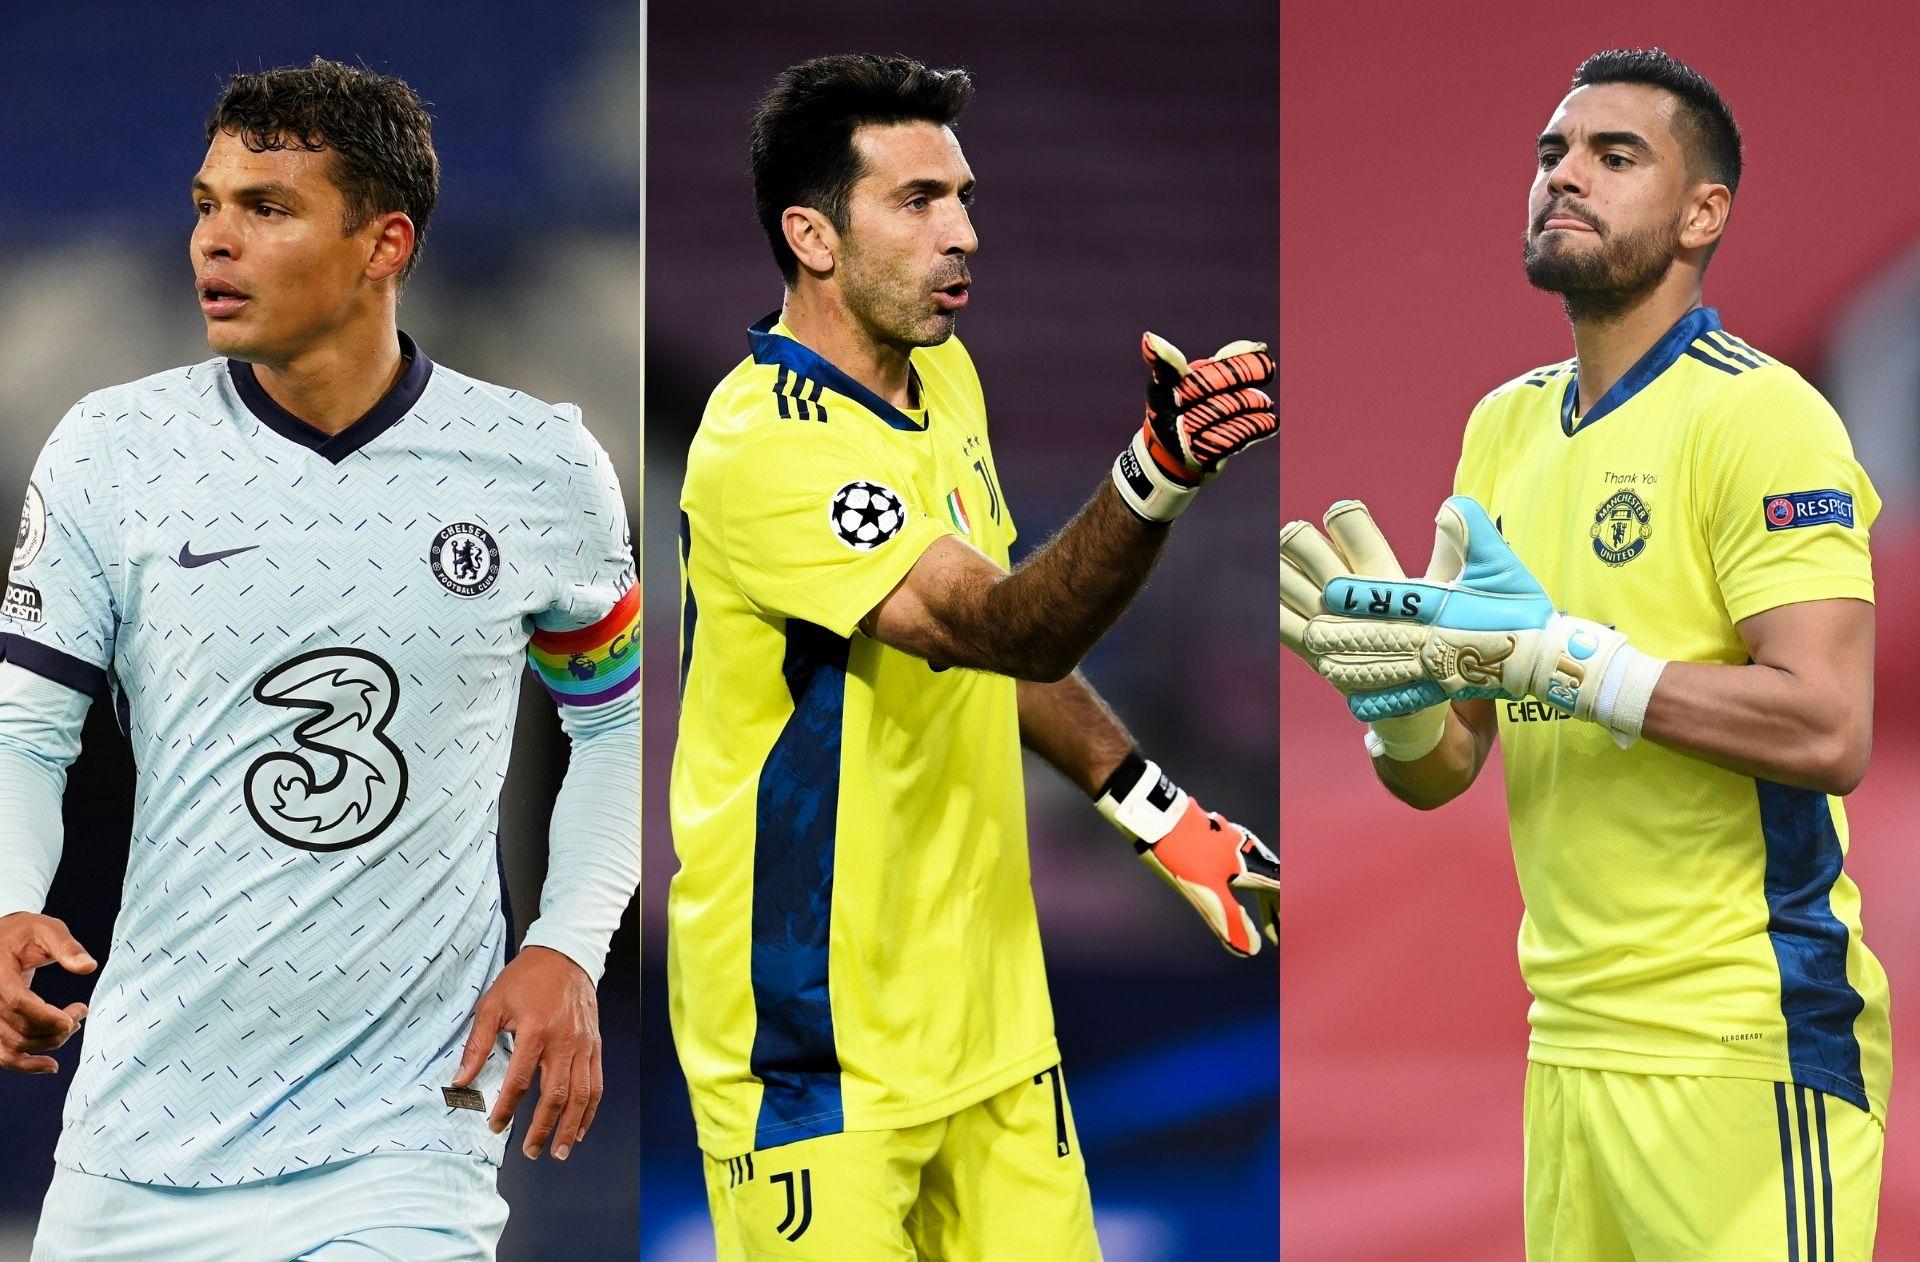 Thiago Silva of Chelsea, Gianluigi Buffon of Juventus, Sergio Romero of Man United